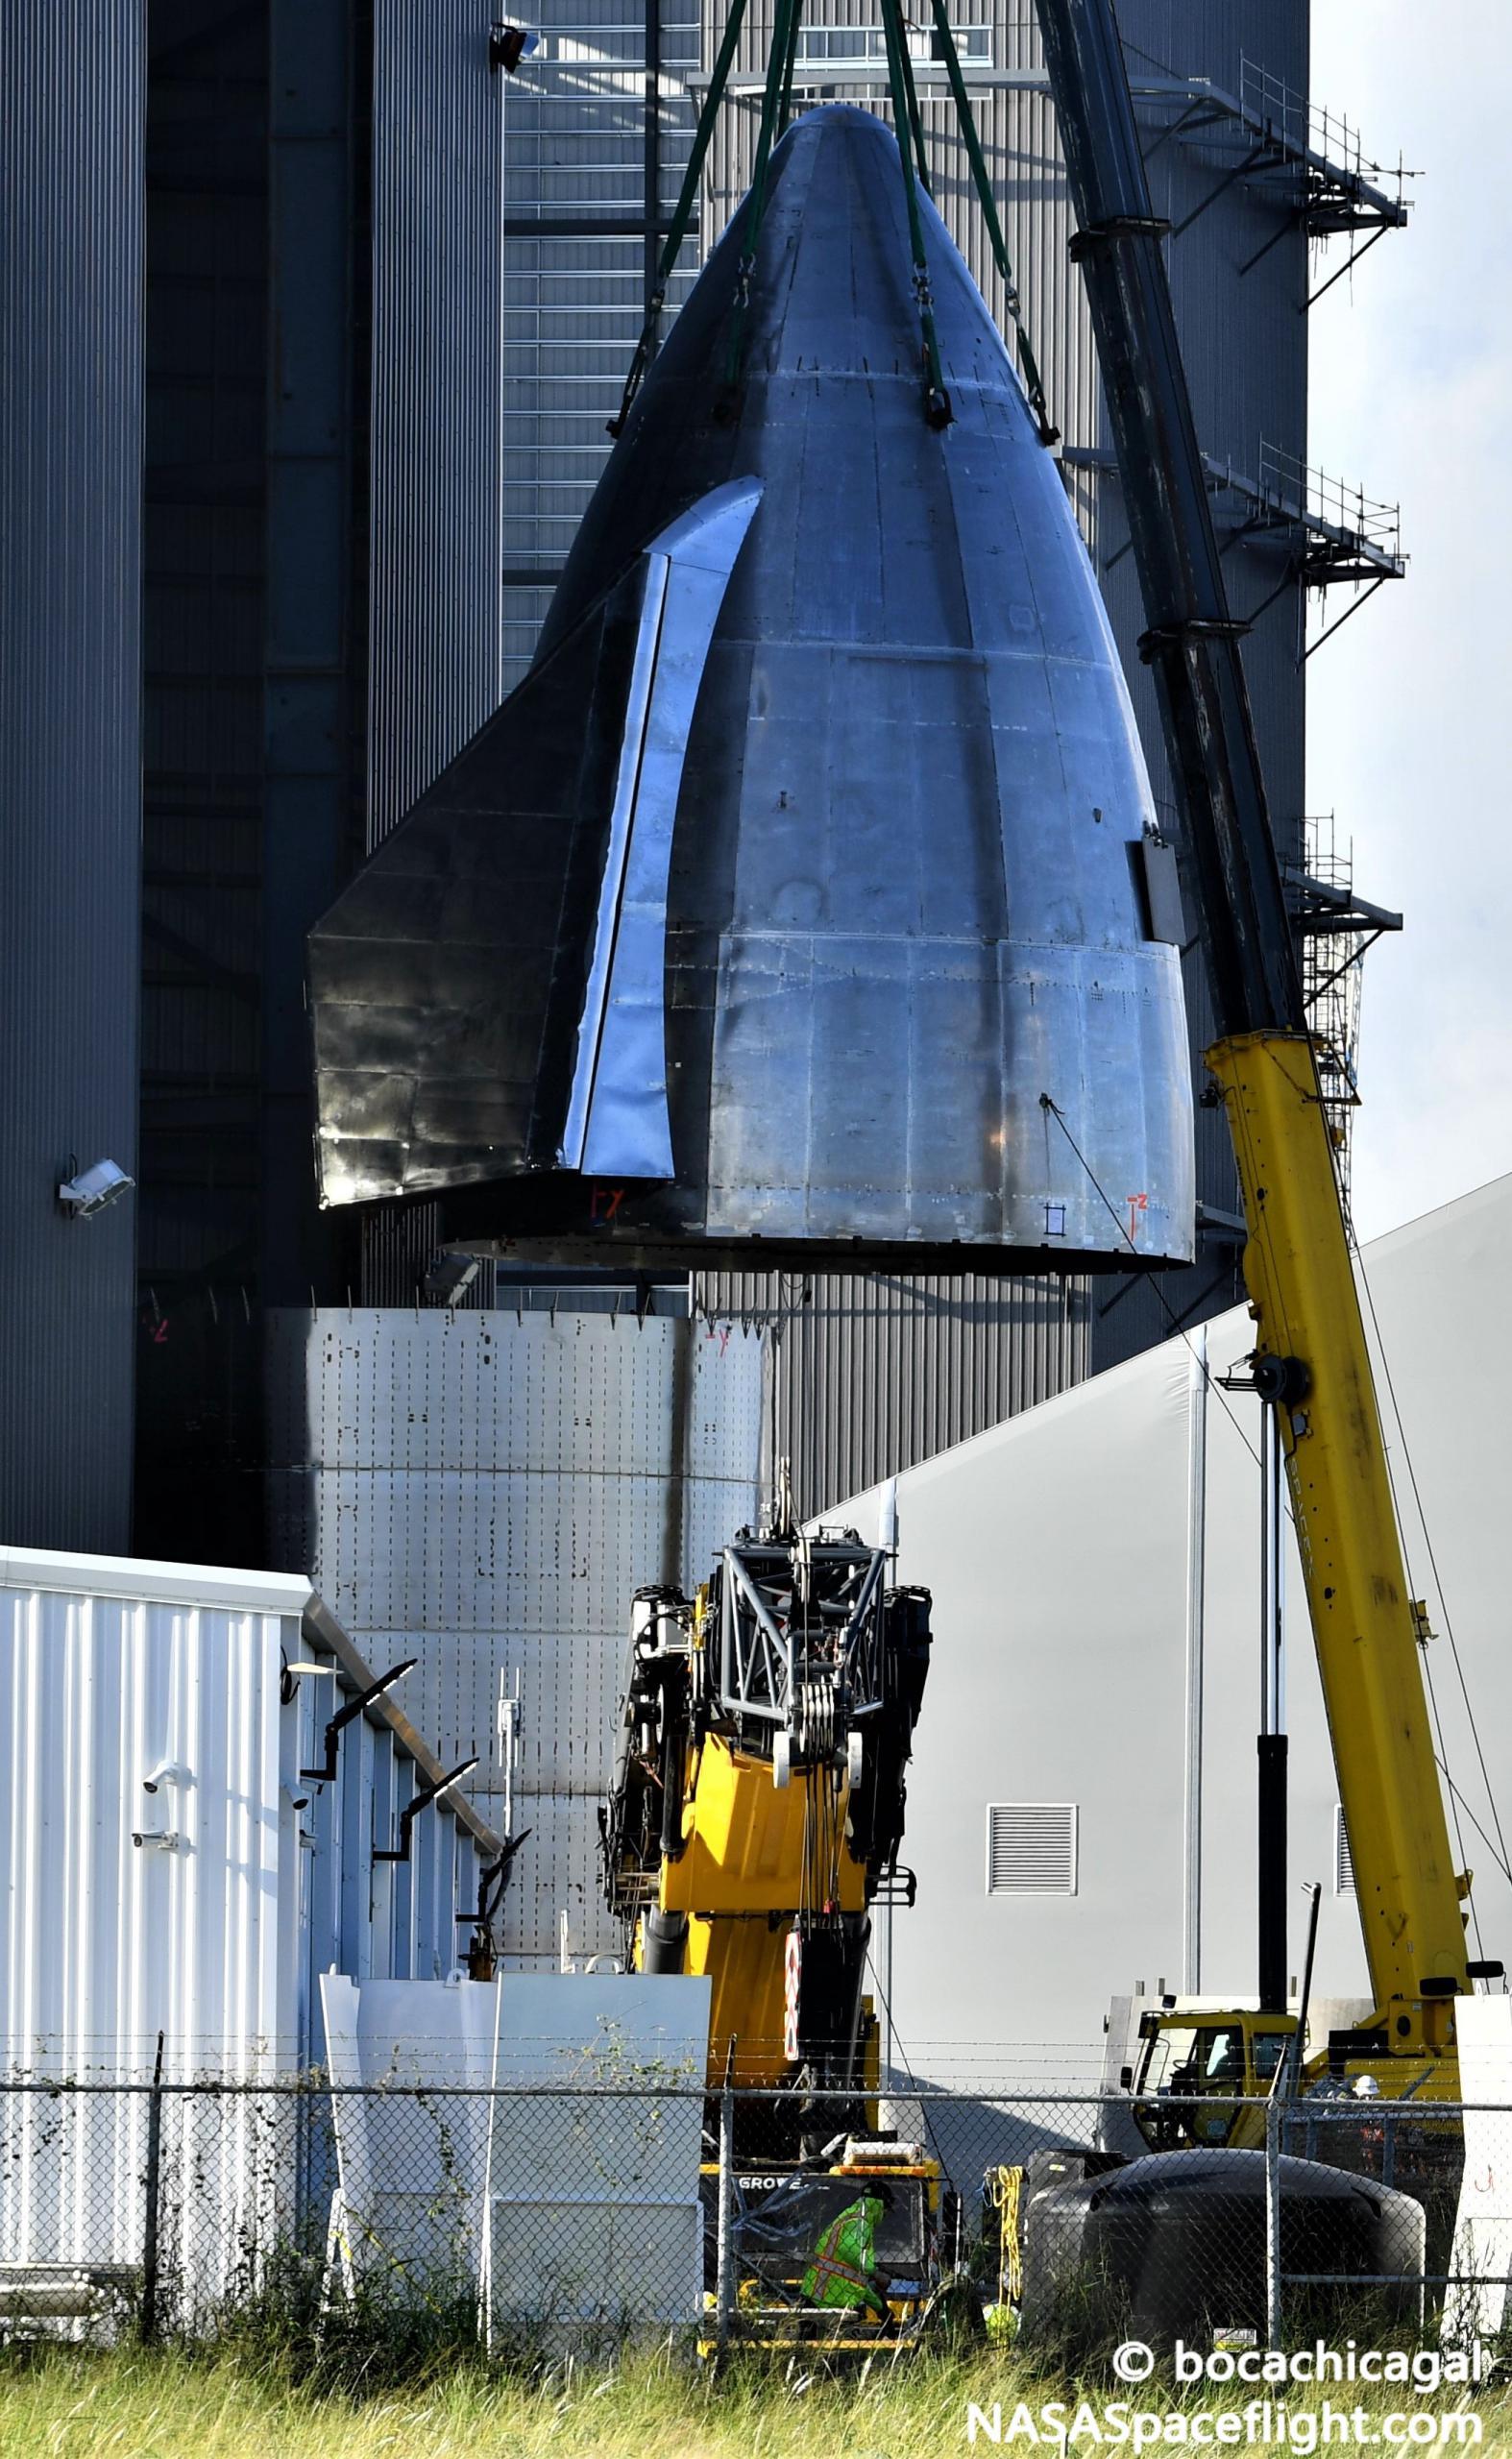 Starship Boca Chica 101920 (NASASpaceflight – bocachicagal) SN8 nosecone stack 2 crop (c)